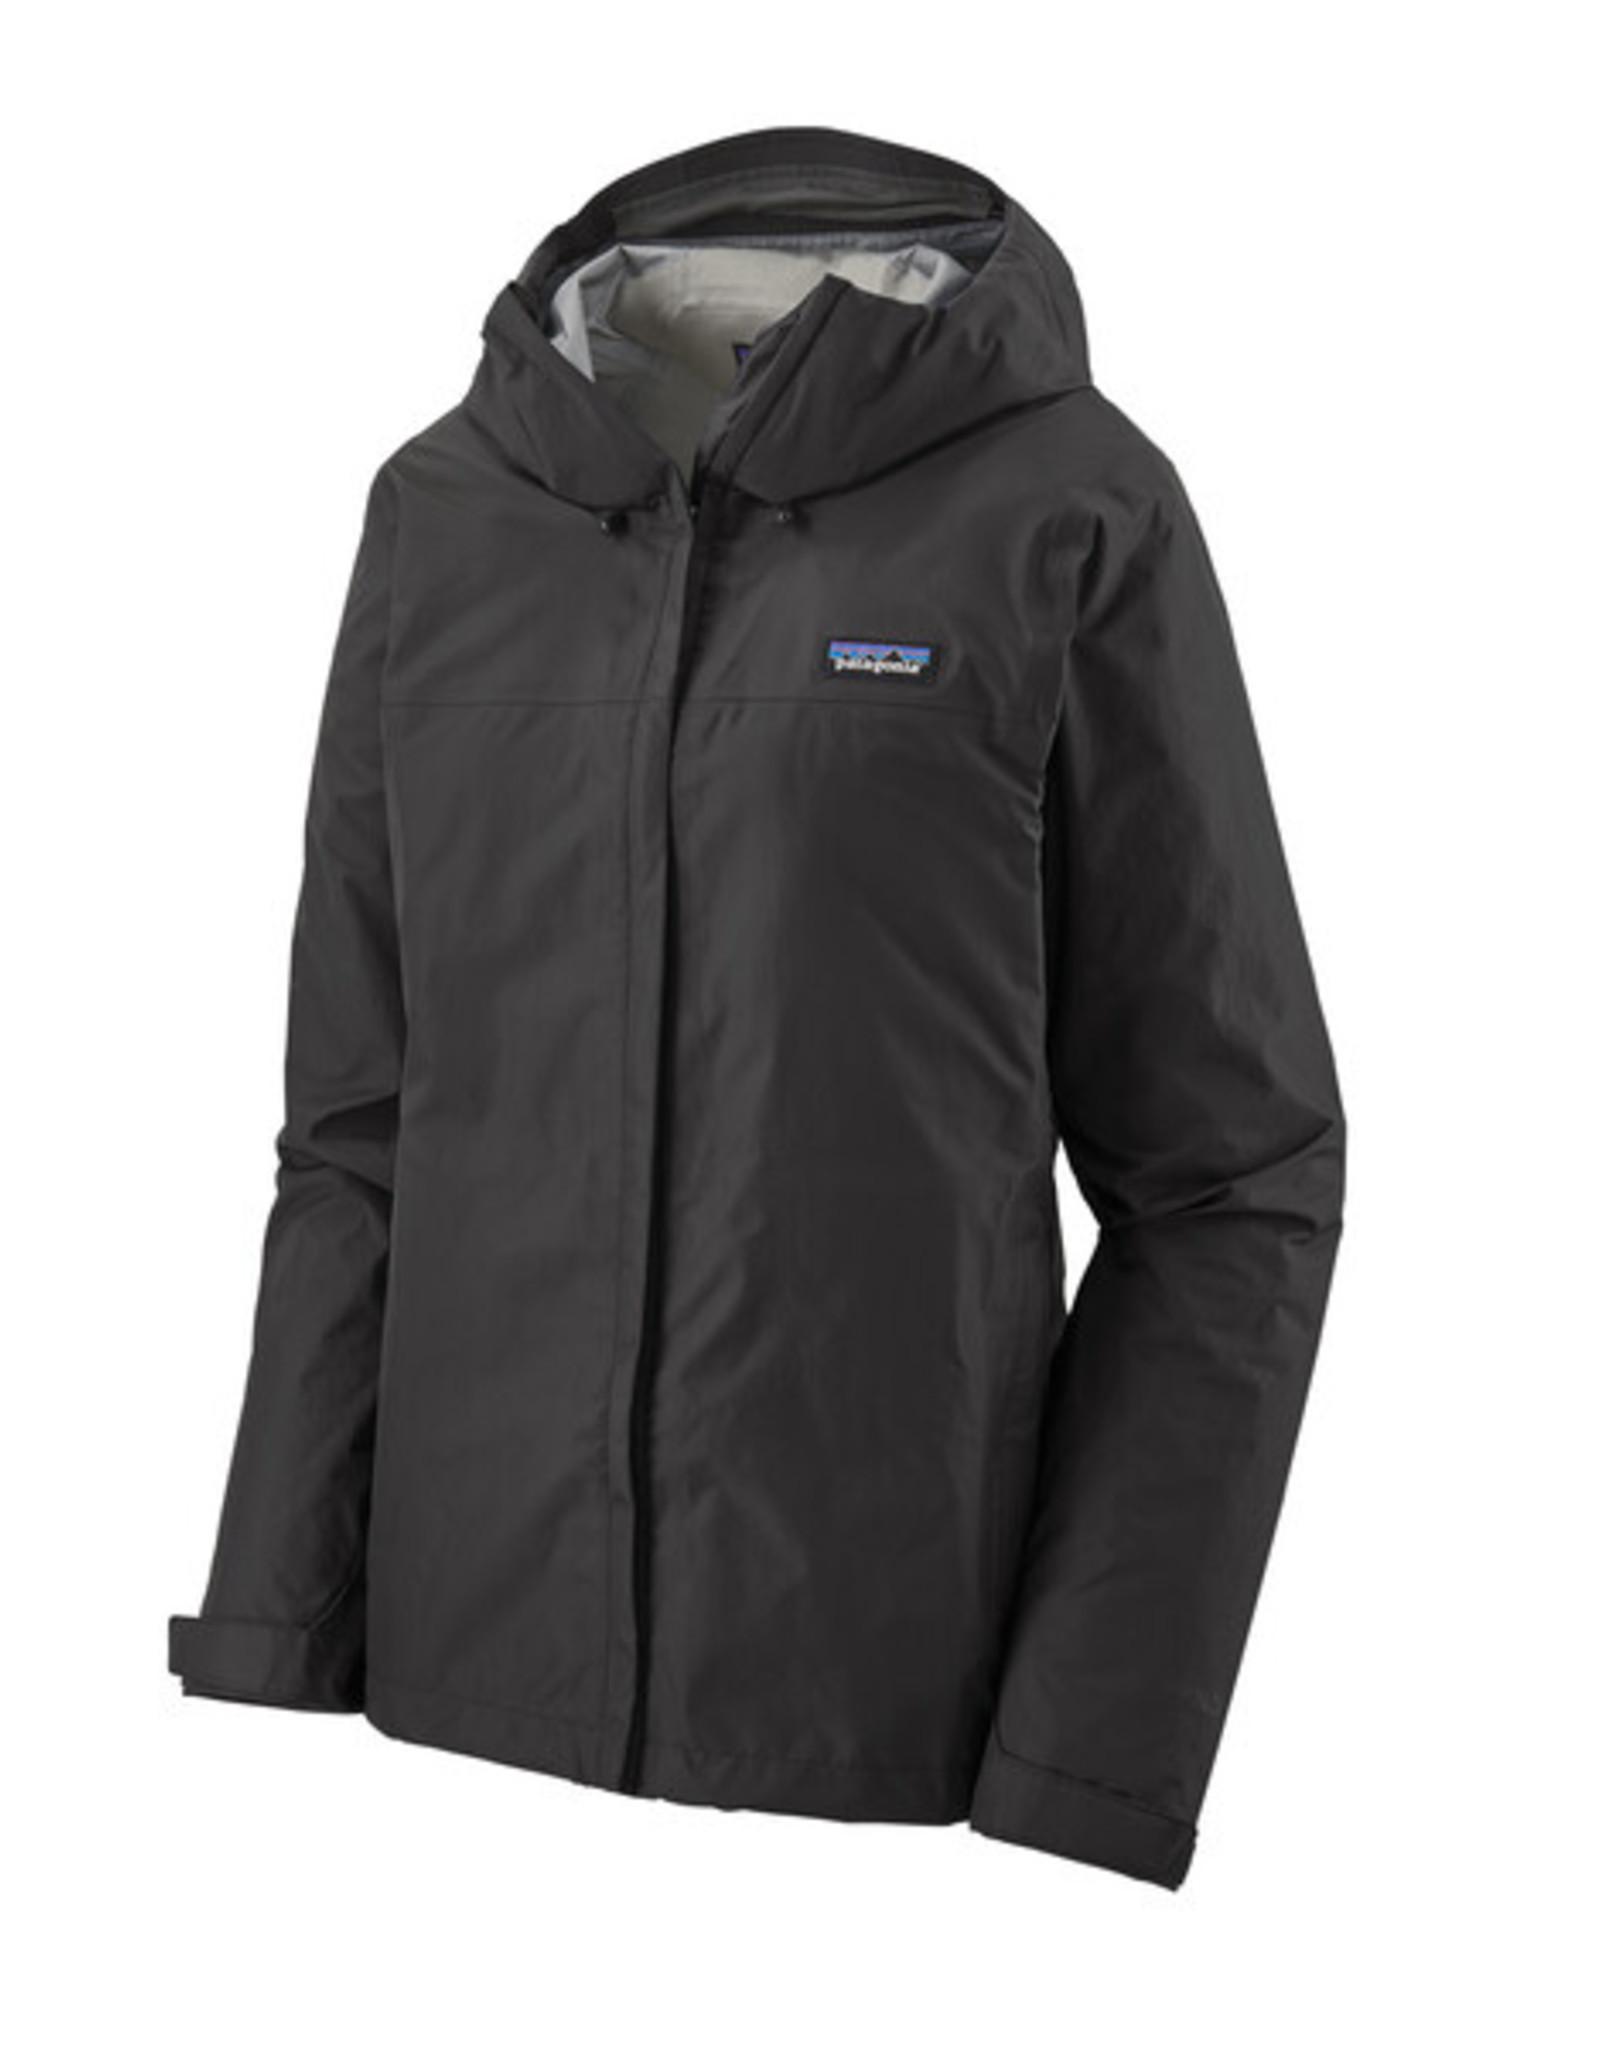 Patagonia - W's Torrentshell 3L Jacket -